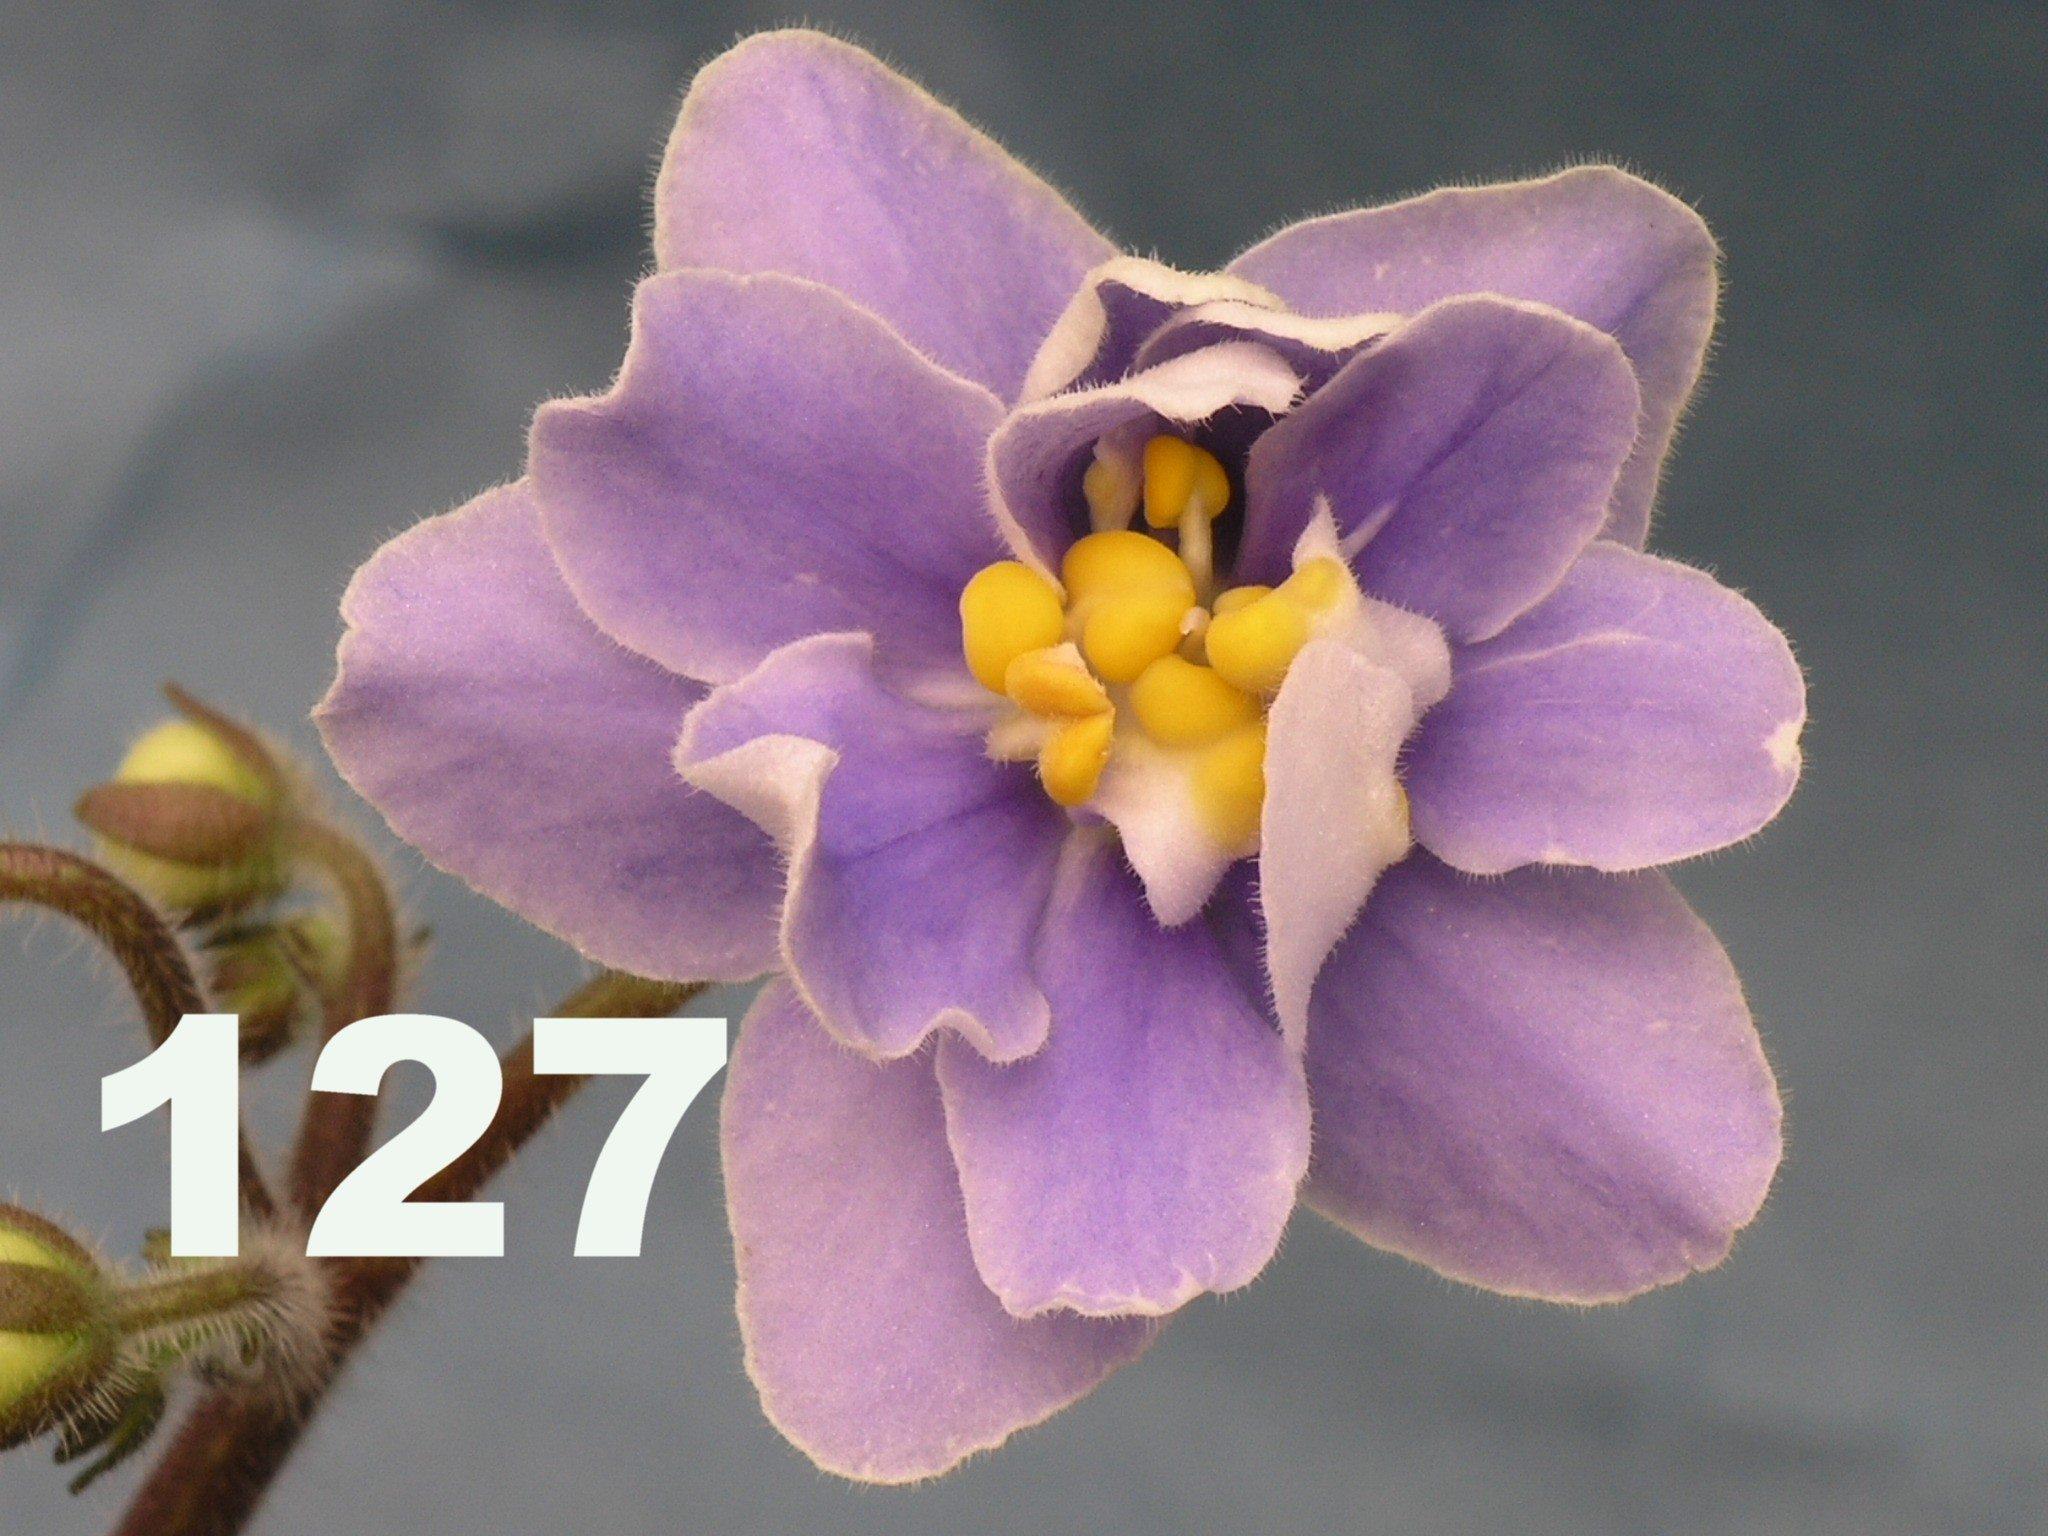 [127] 127